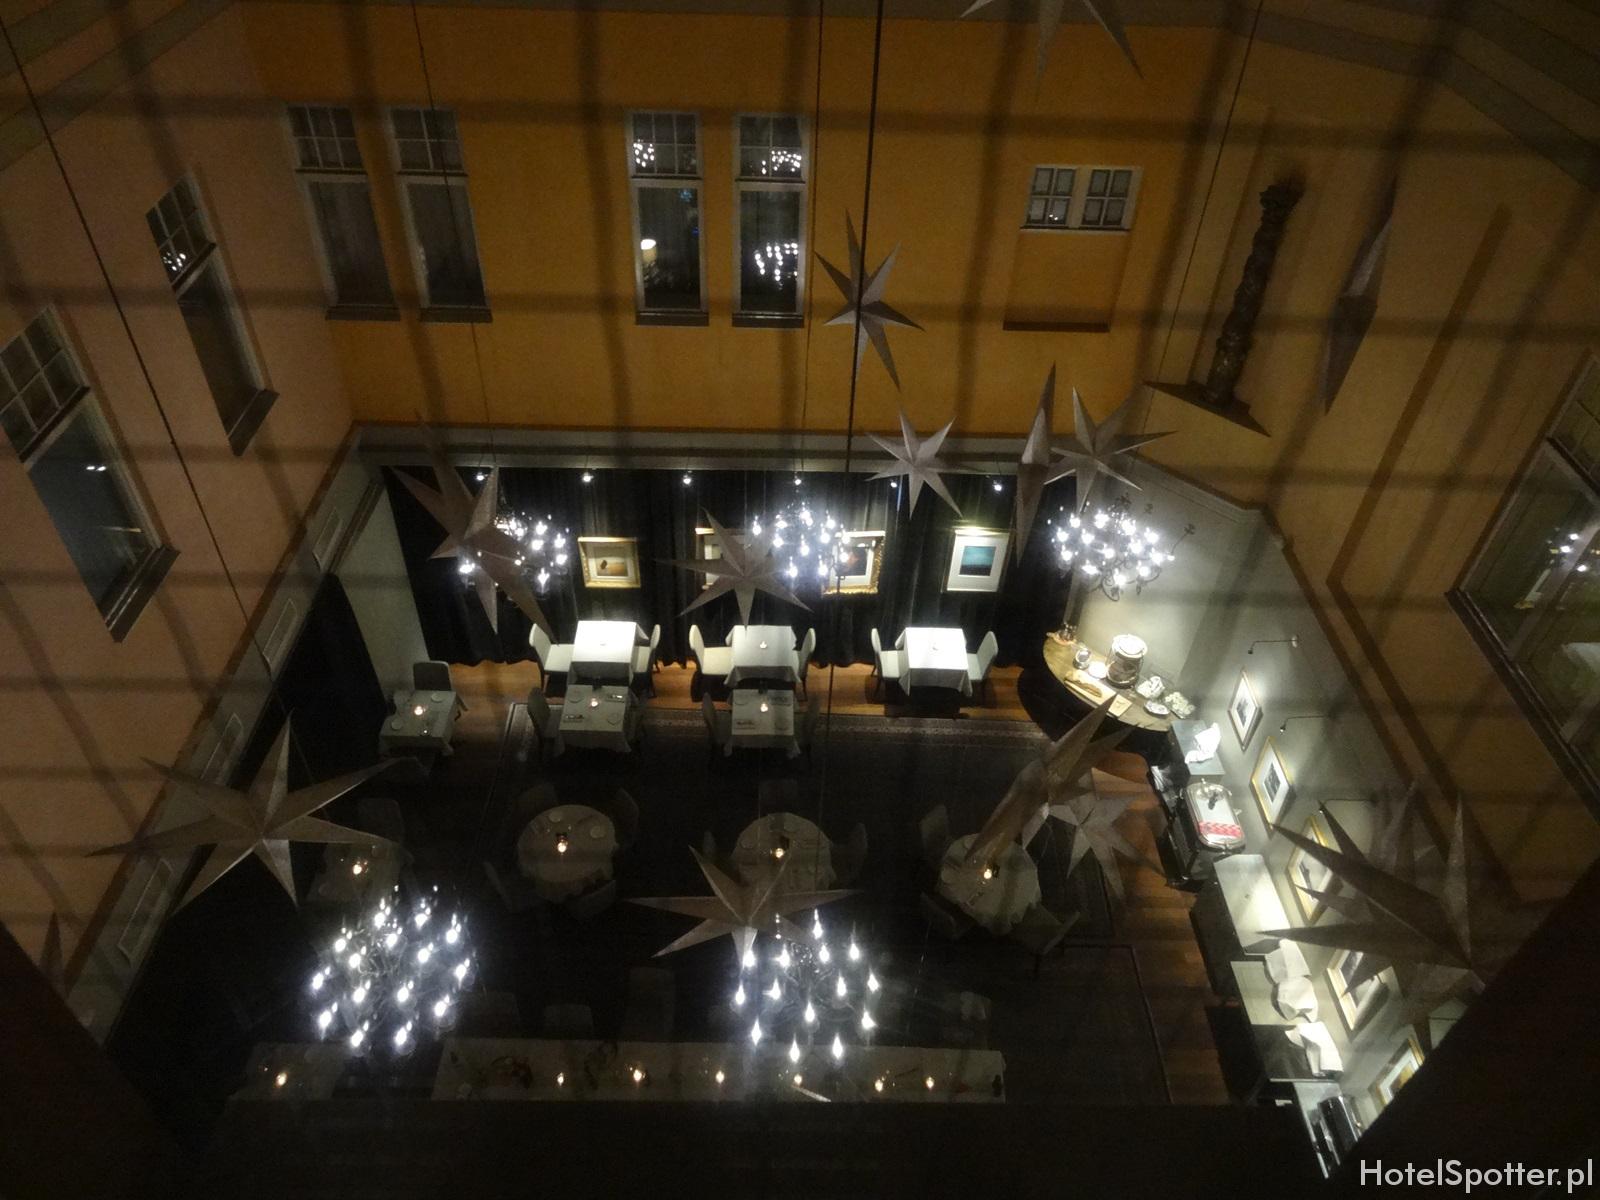 Radisson Blu Strand Hotel, Stockholm - restauracja w atrium